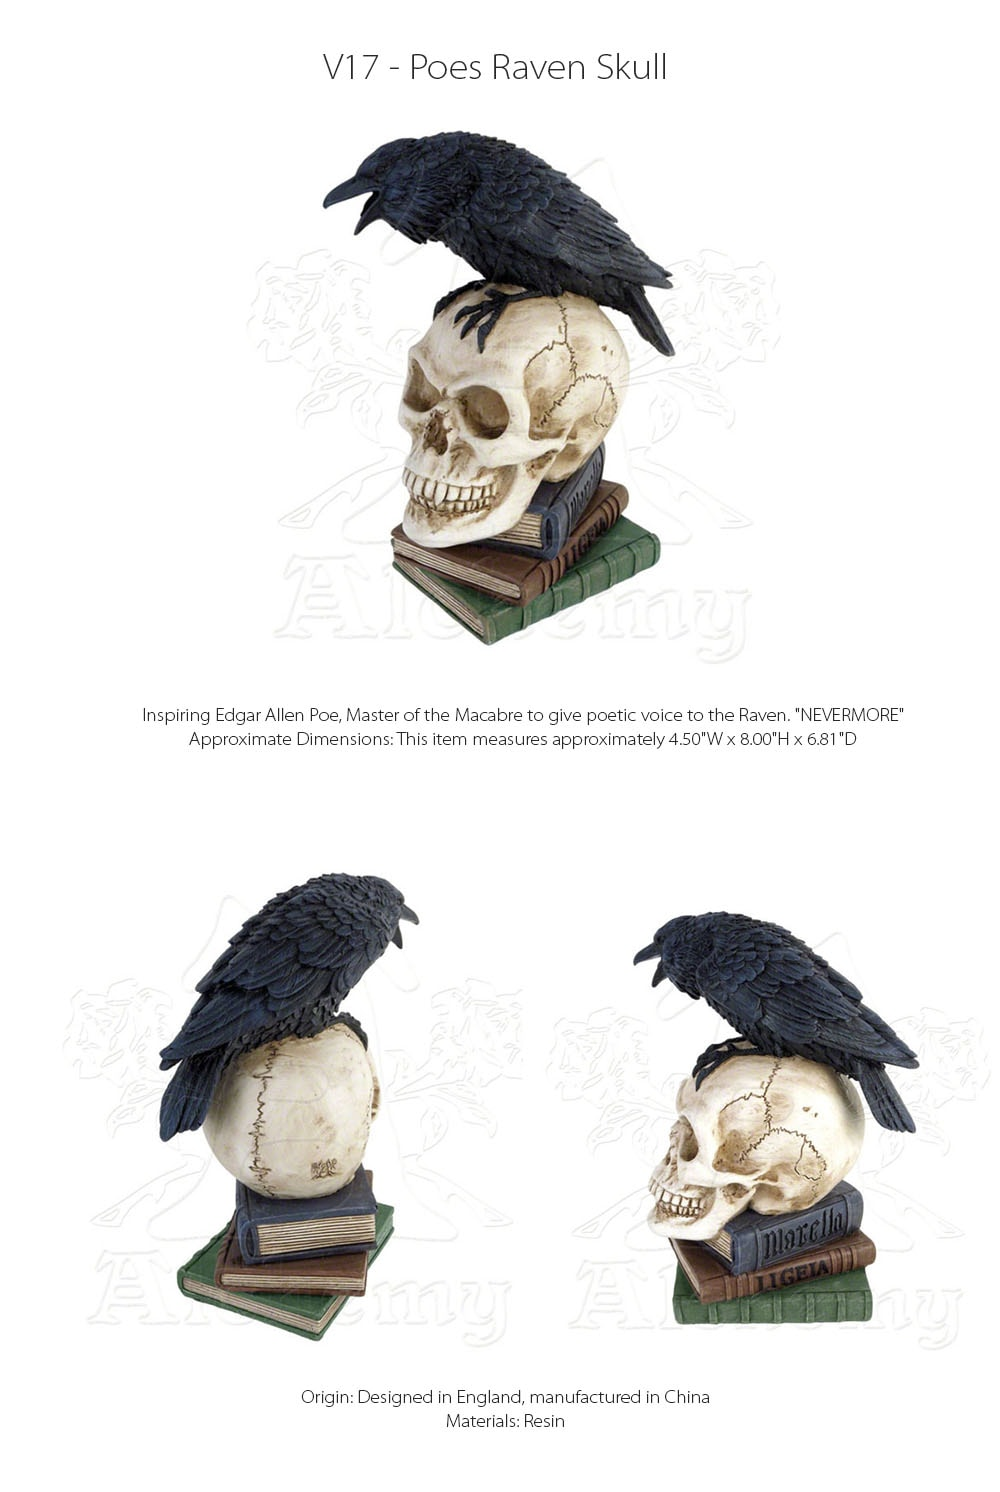 Poes Raven Skull Designed in England